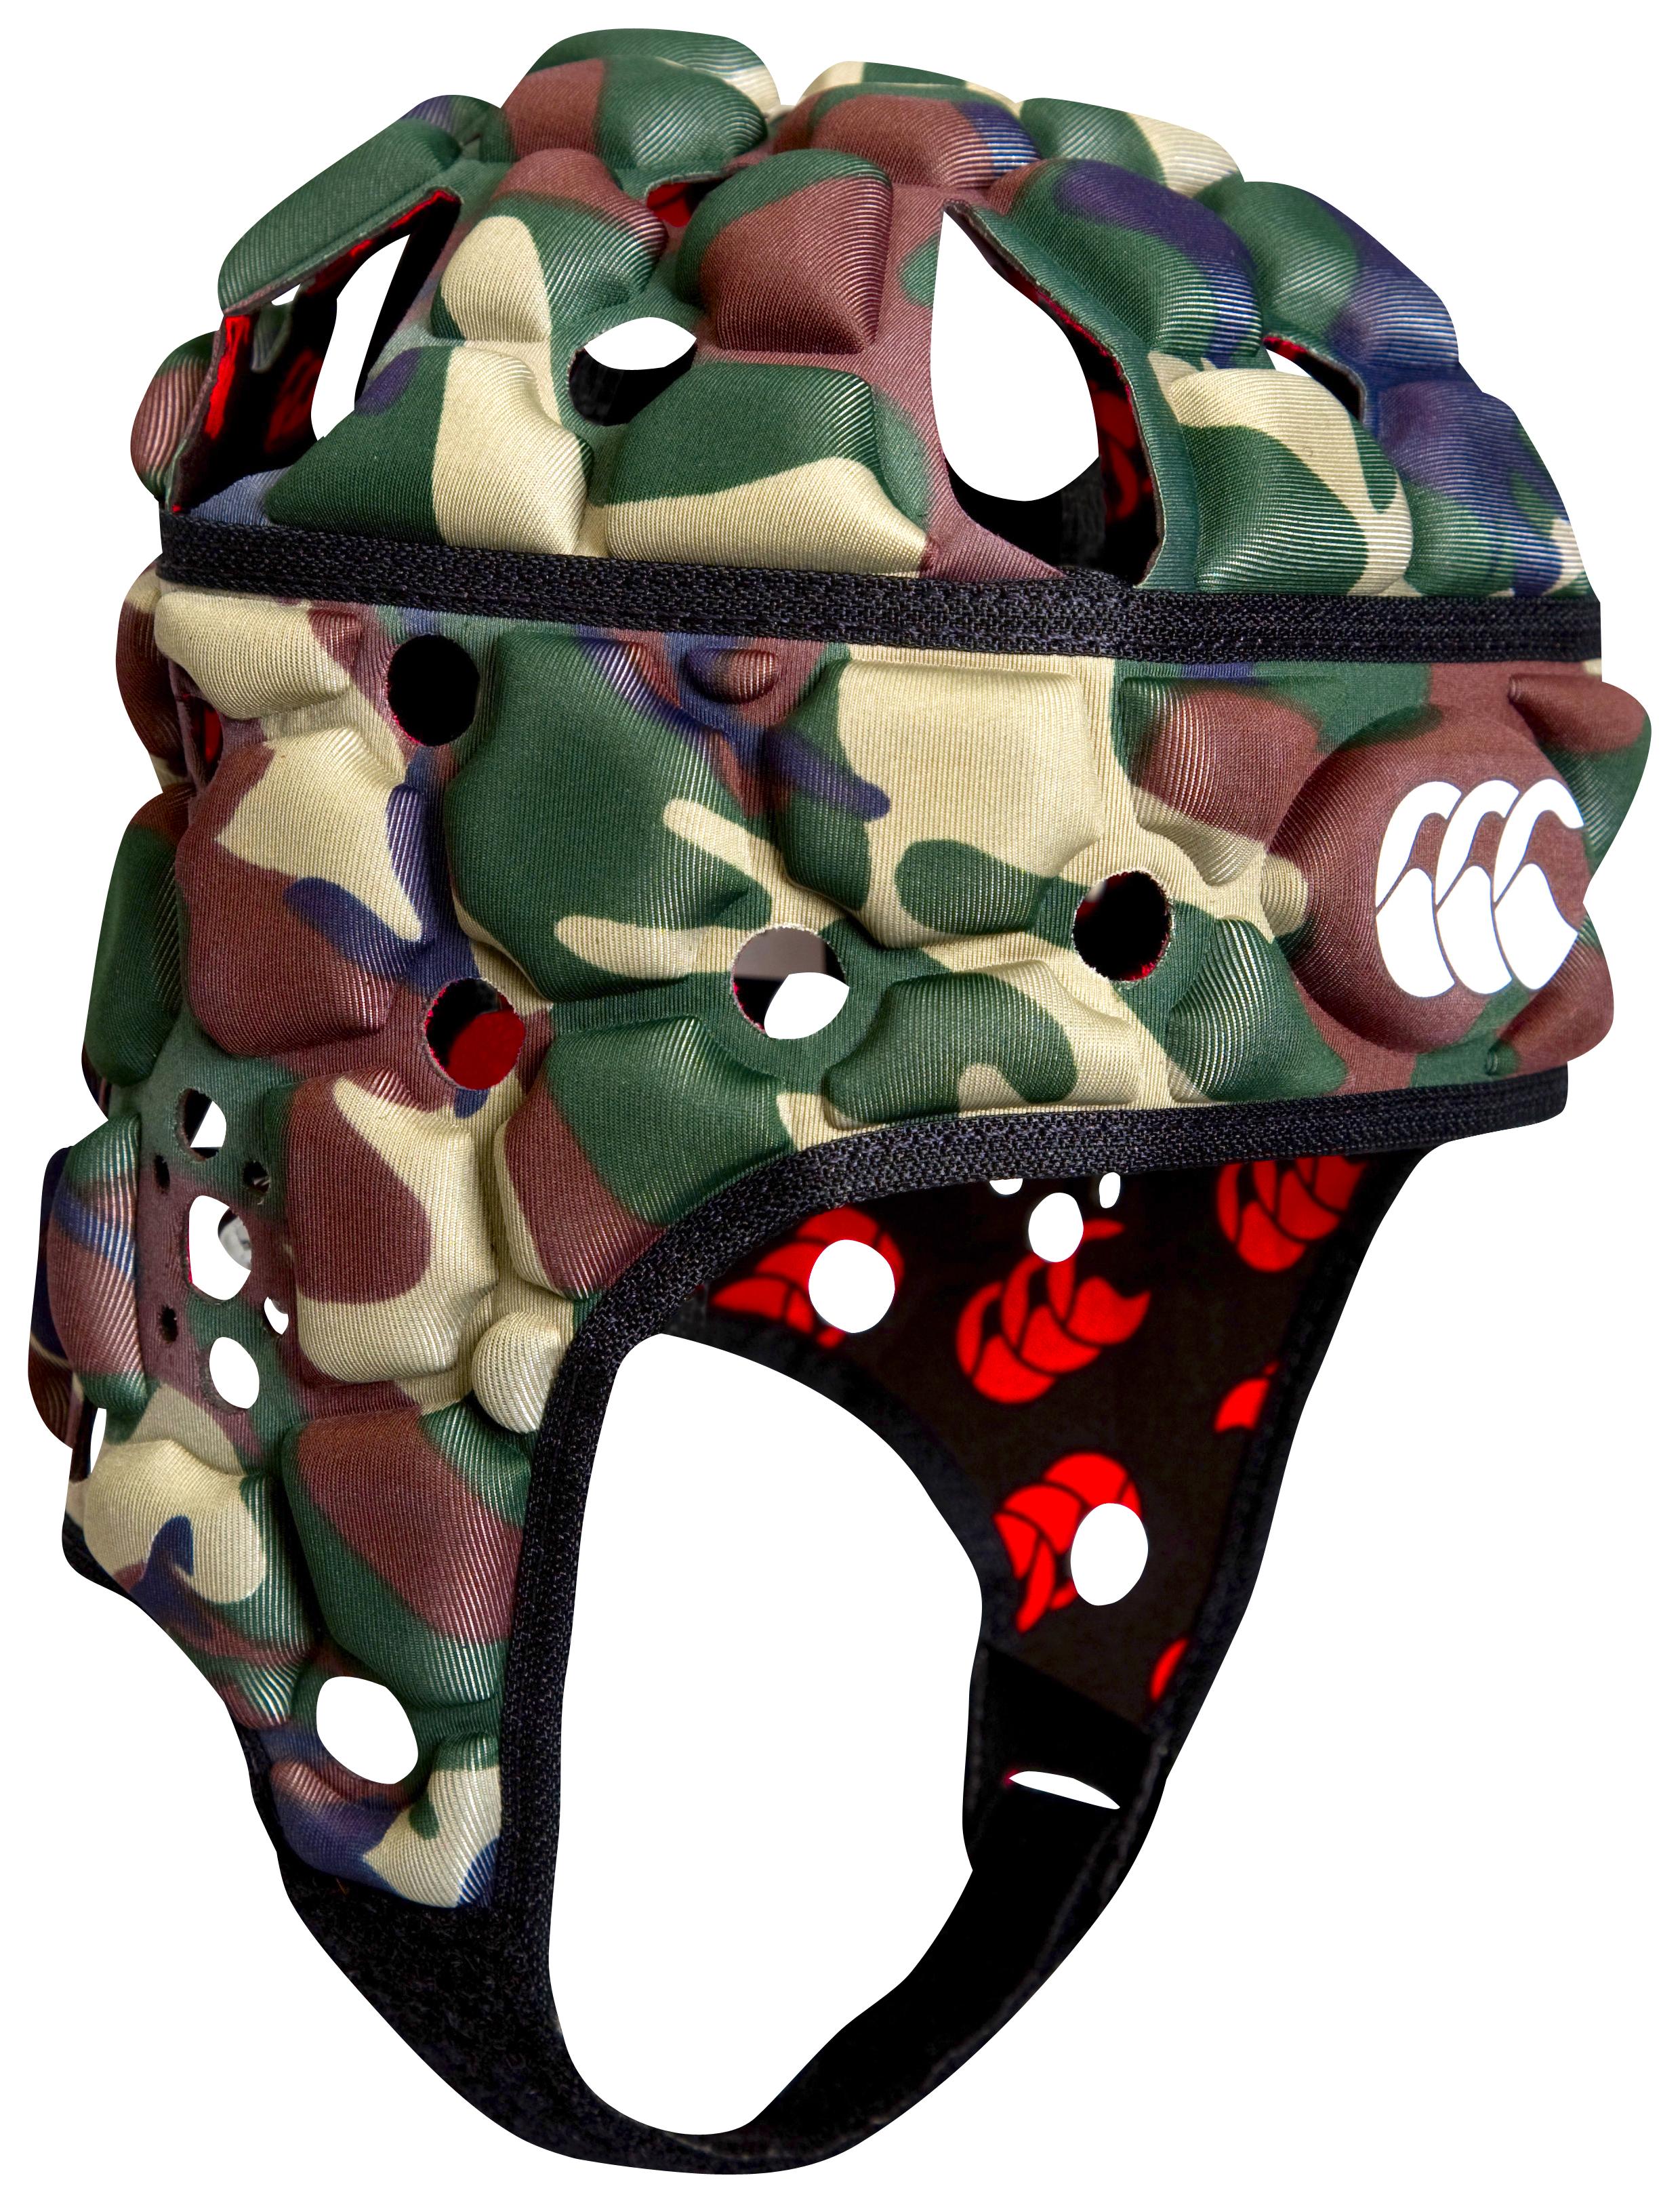 Canterbury Ventilator Rugby Headguard - Camoflage